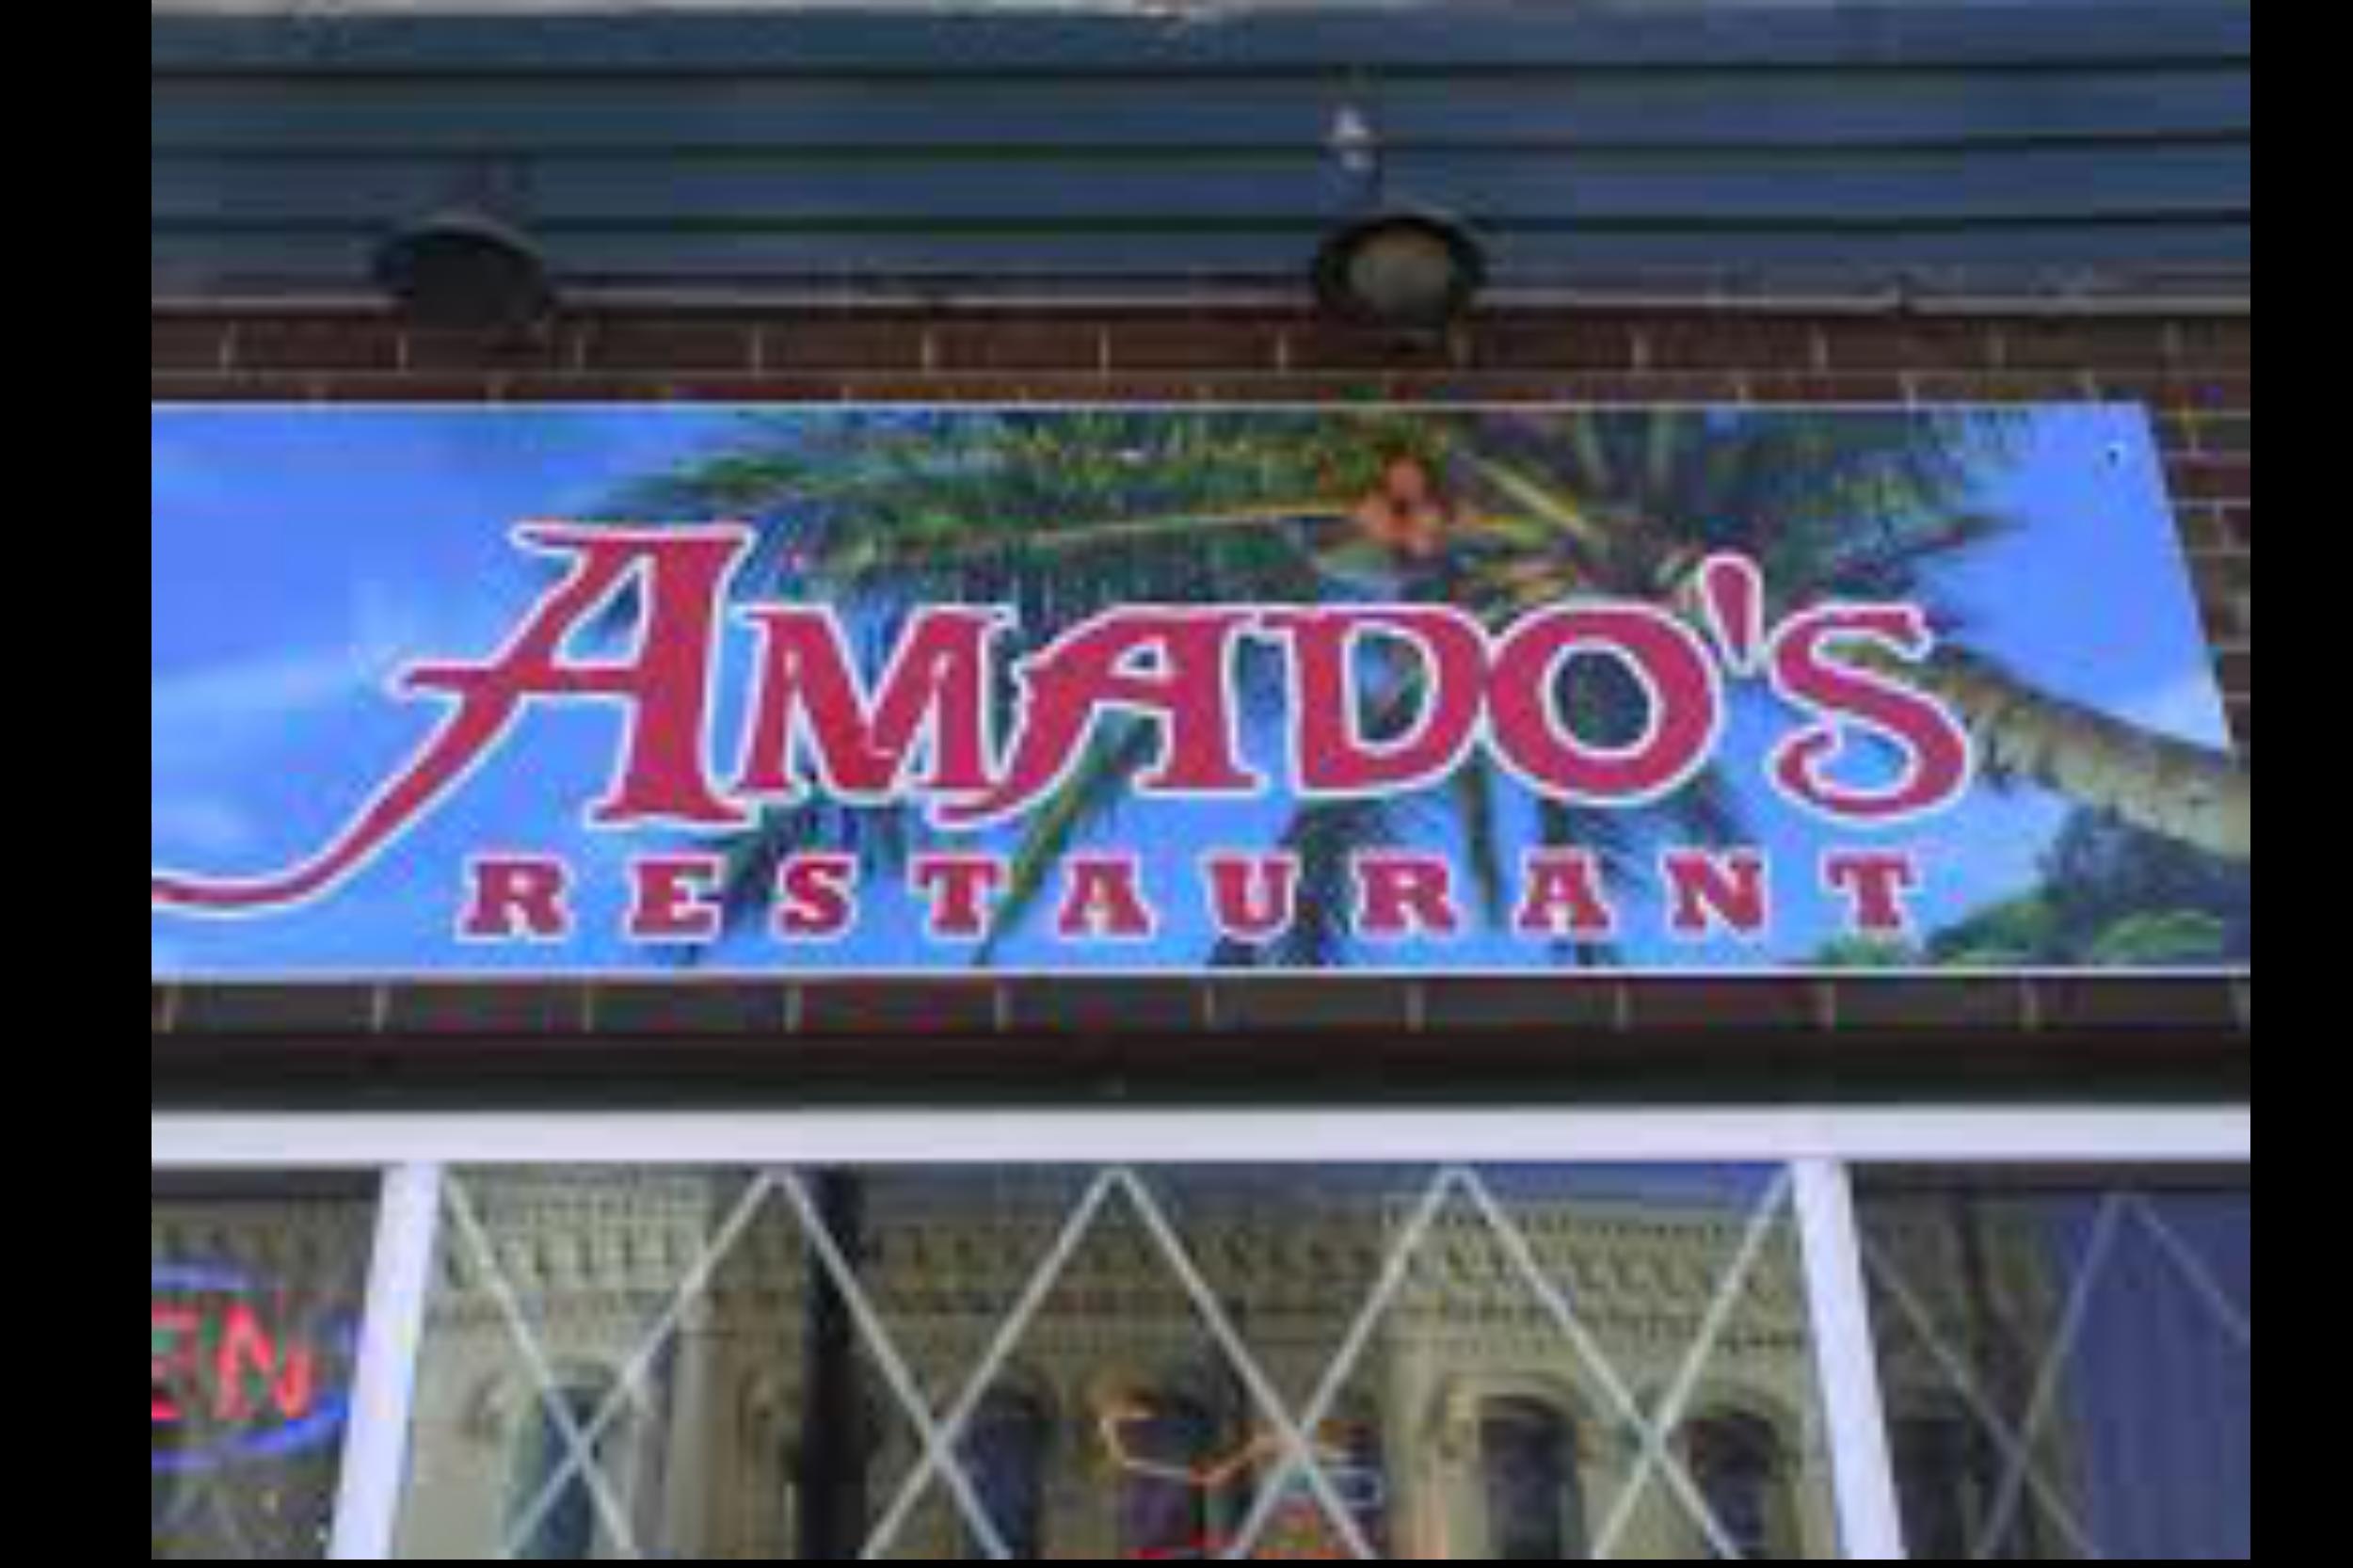 Amado's Restaurant